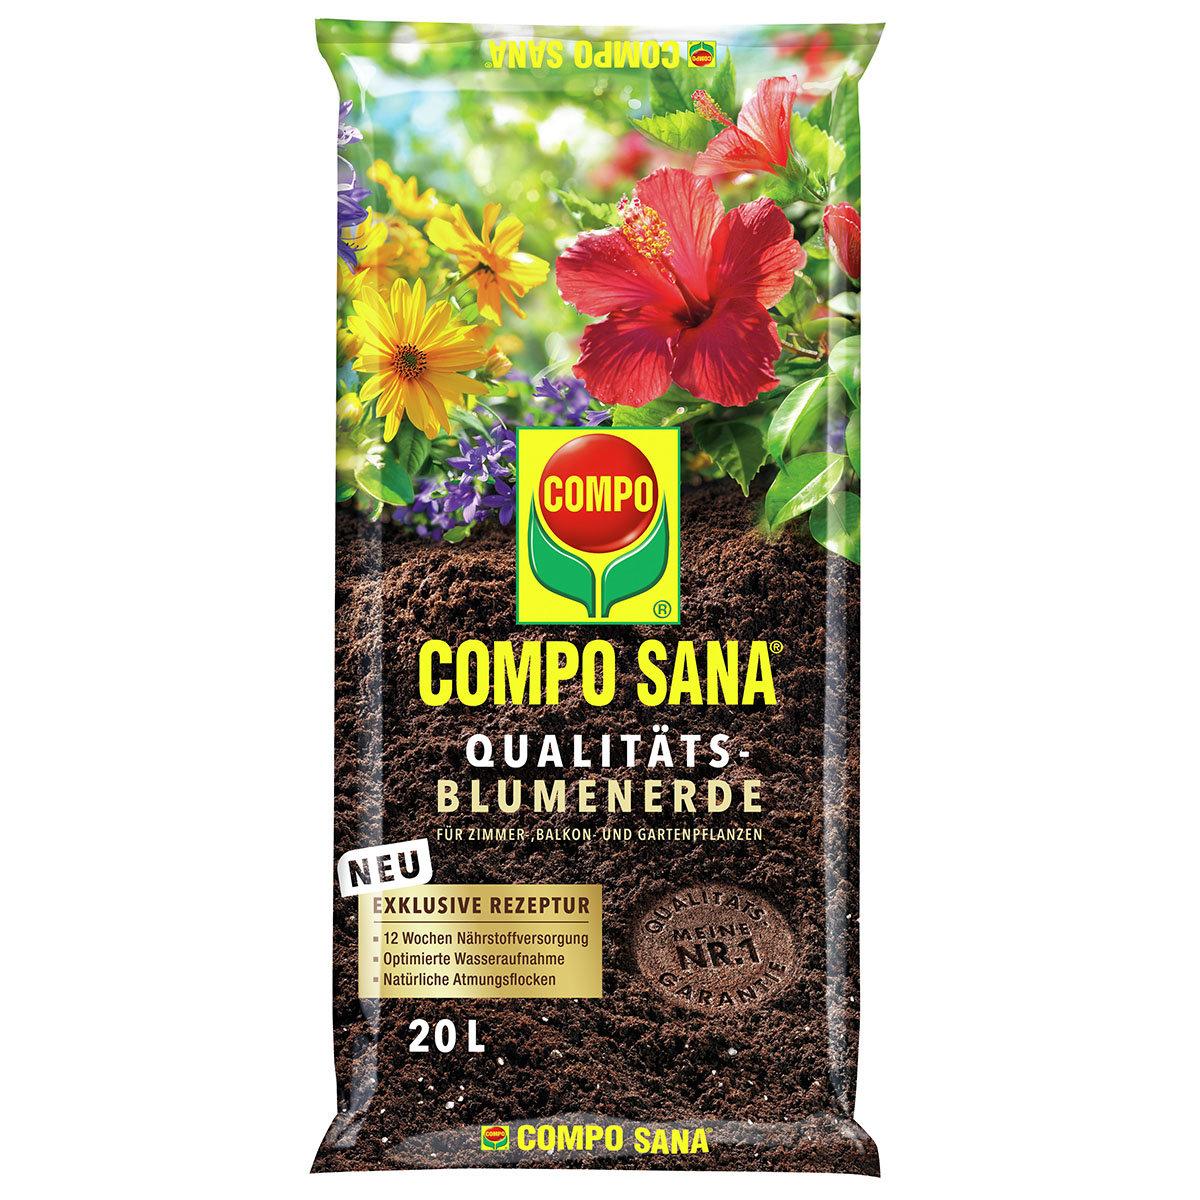 Compo Sana® Qualitäts-Blumenerde, 20 Liter